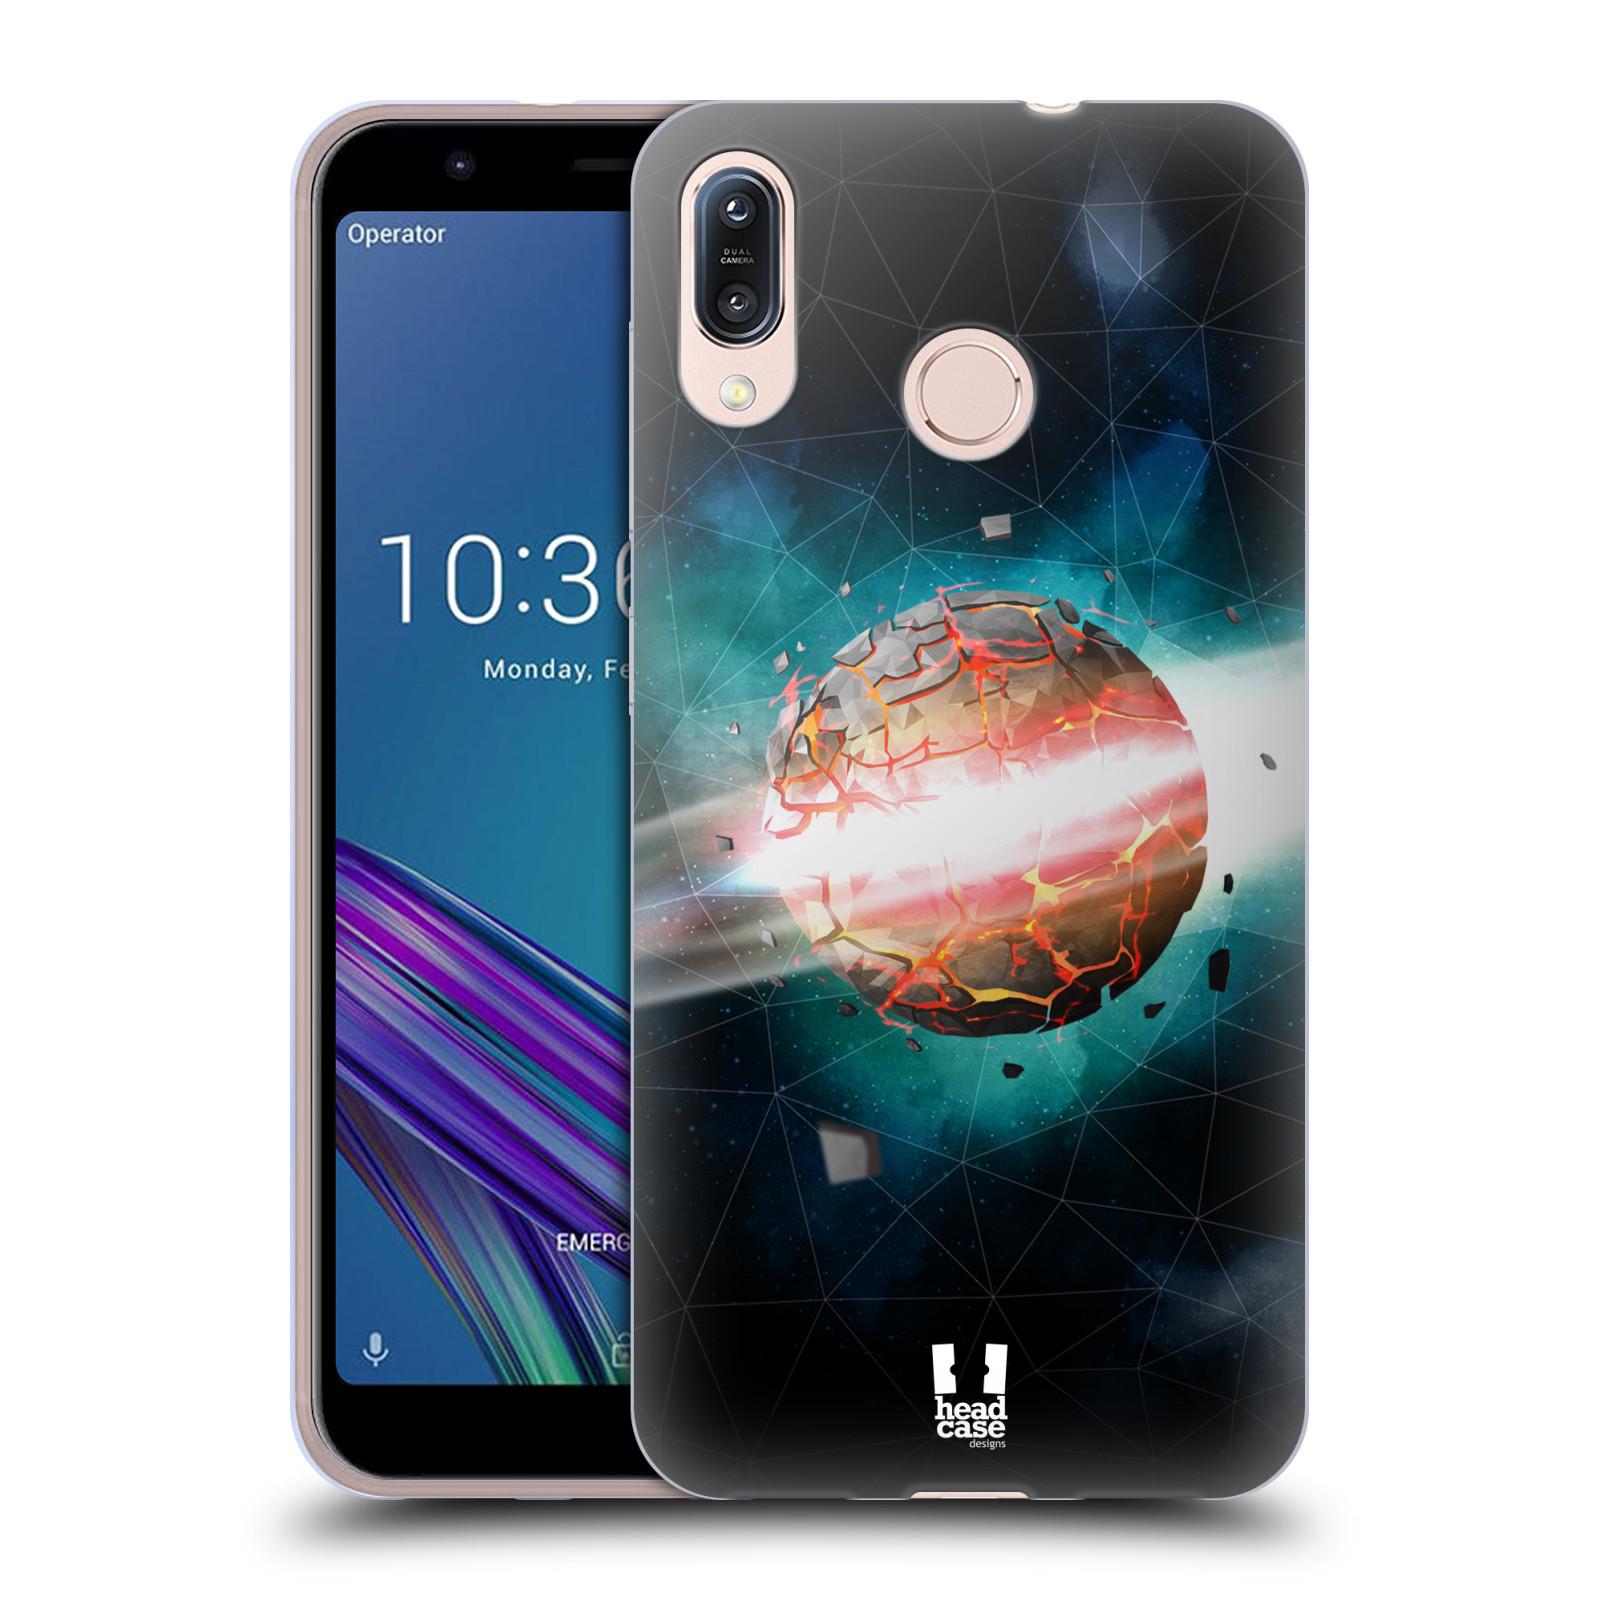 Silikonové pouzdro na mobil Asus Zenfone Max M1 ZB555KL - Head Case - UNIVERSE EXPLOSION